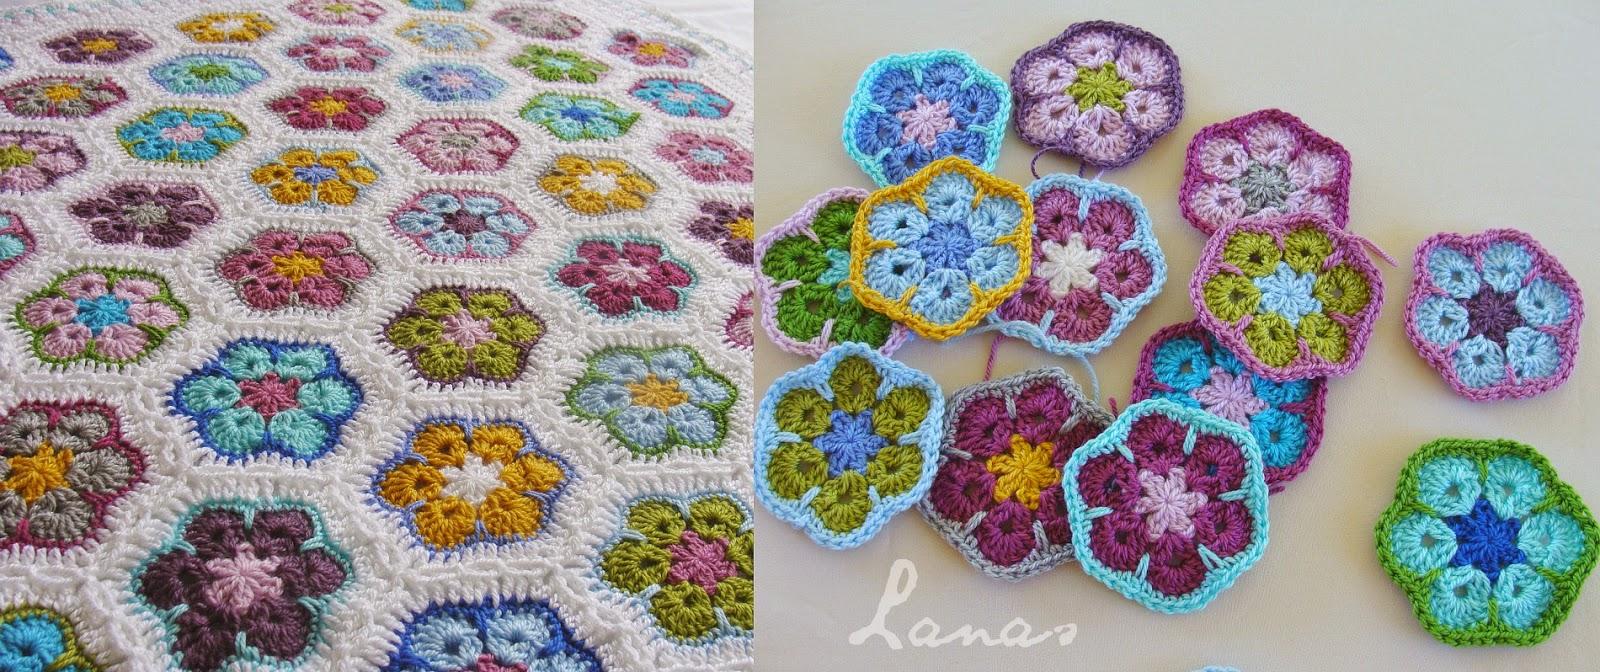 African Flower Crochet Baby Blanket Pattern : Lanas de Ana: Blanket: African Flowers